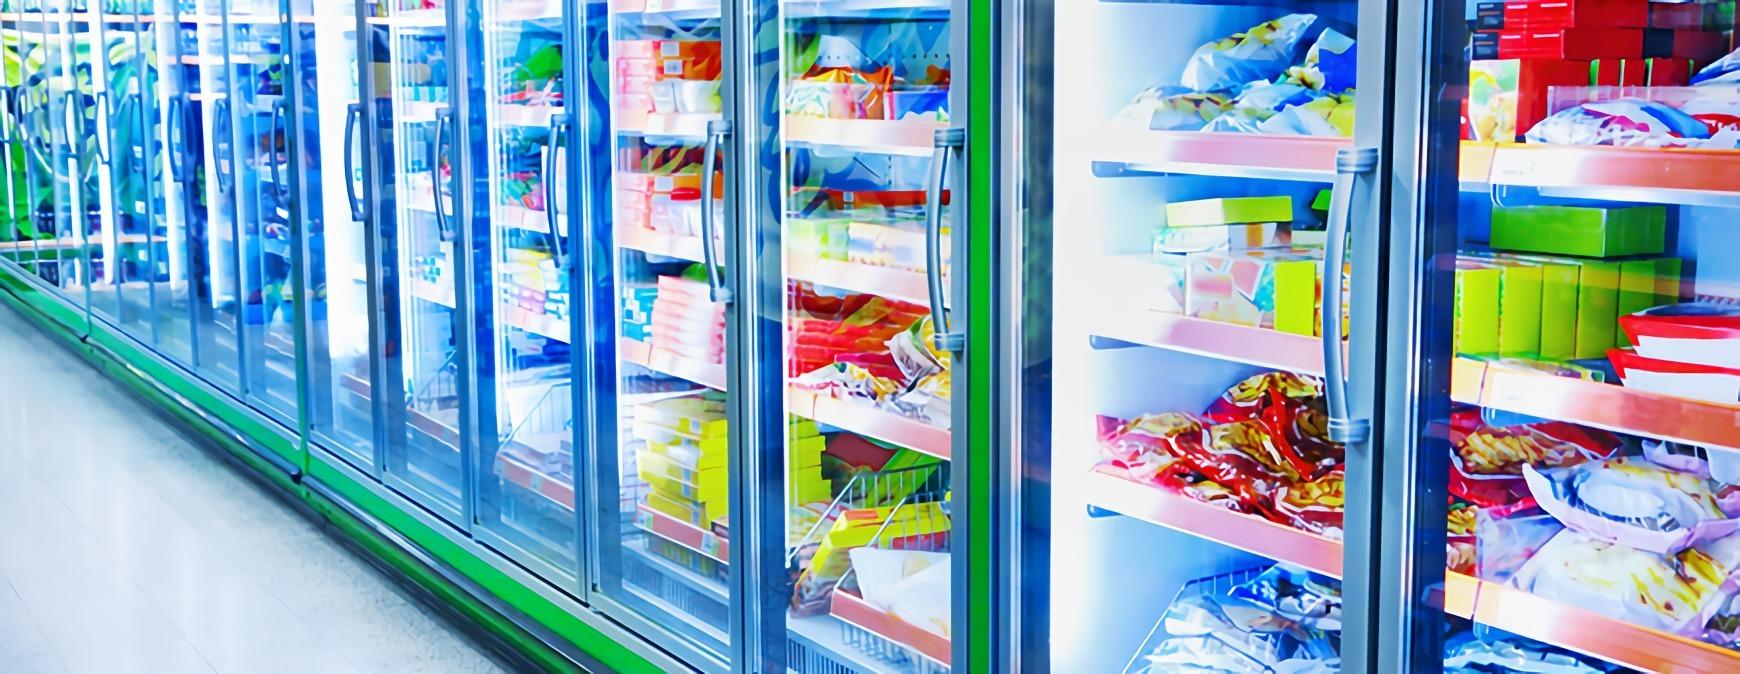 supermarket refrigerator